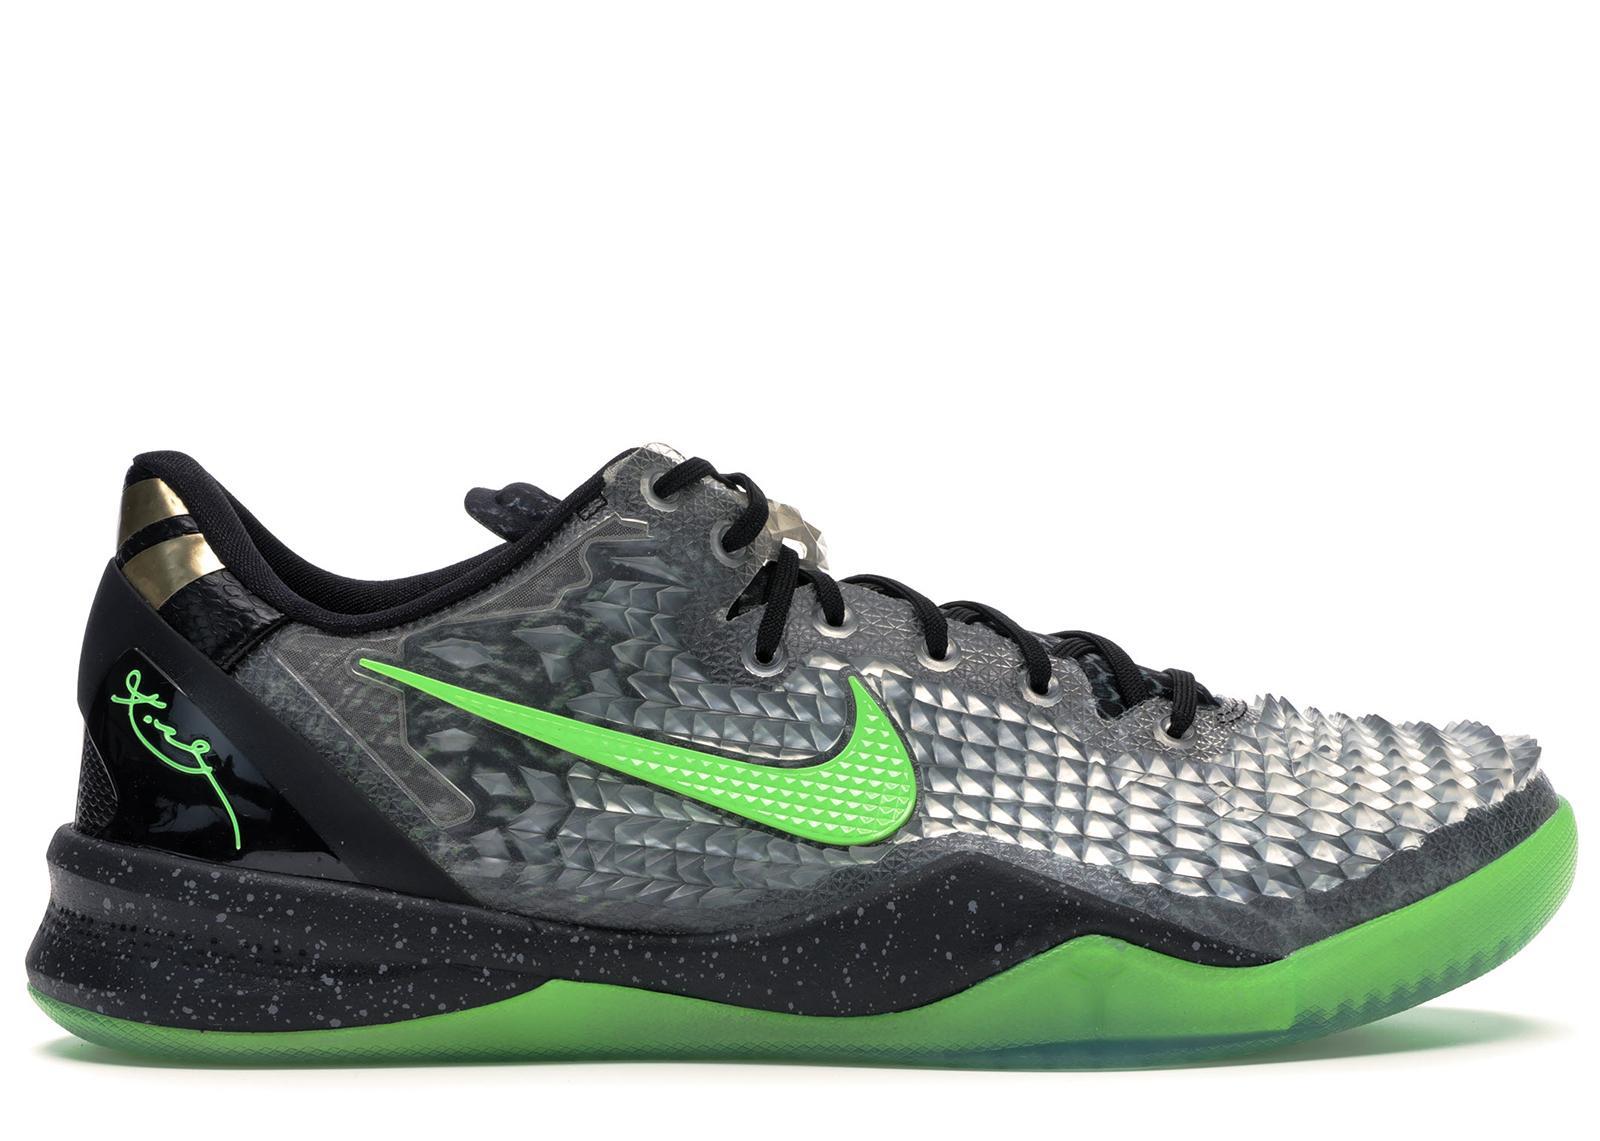 Nike Kobe 8 Ss Christmas (2013) in